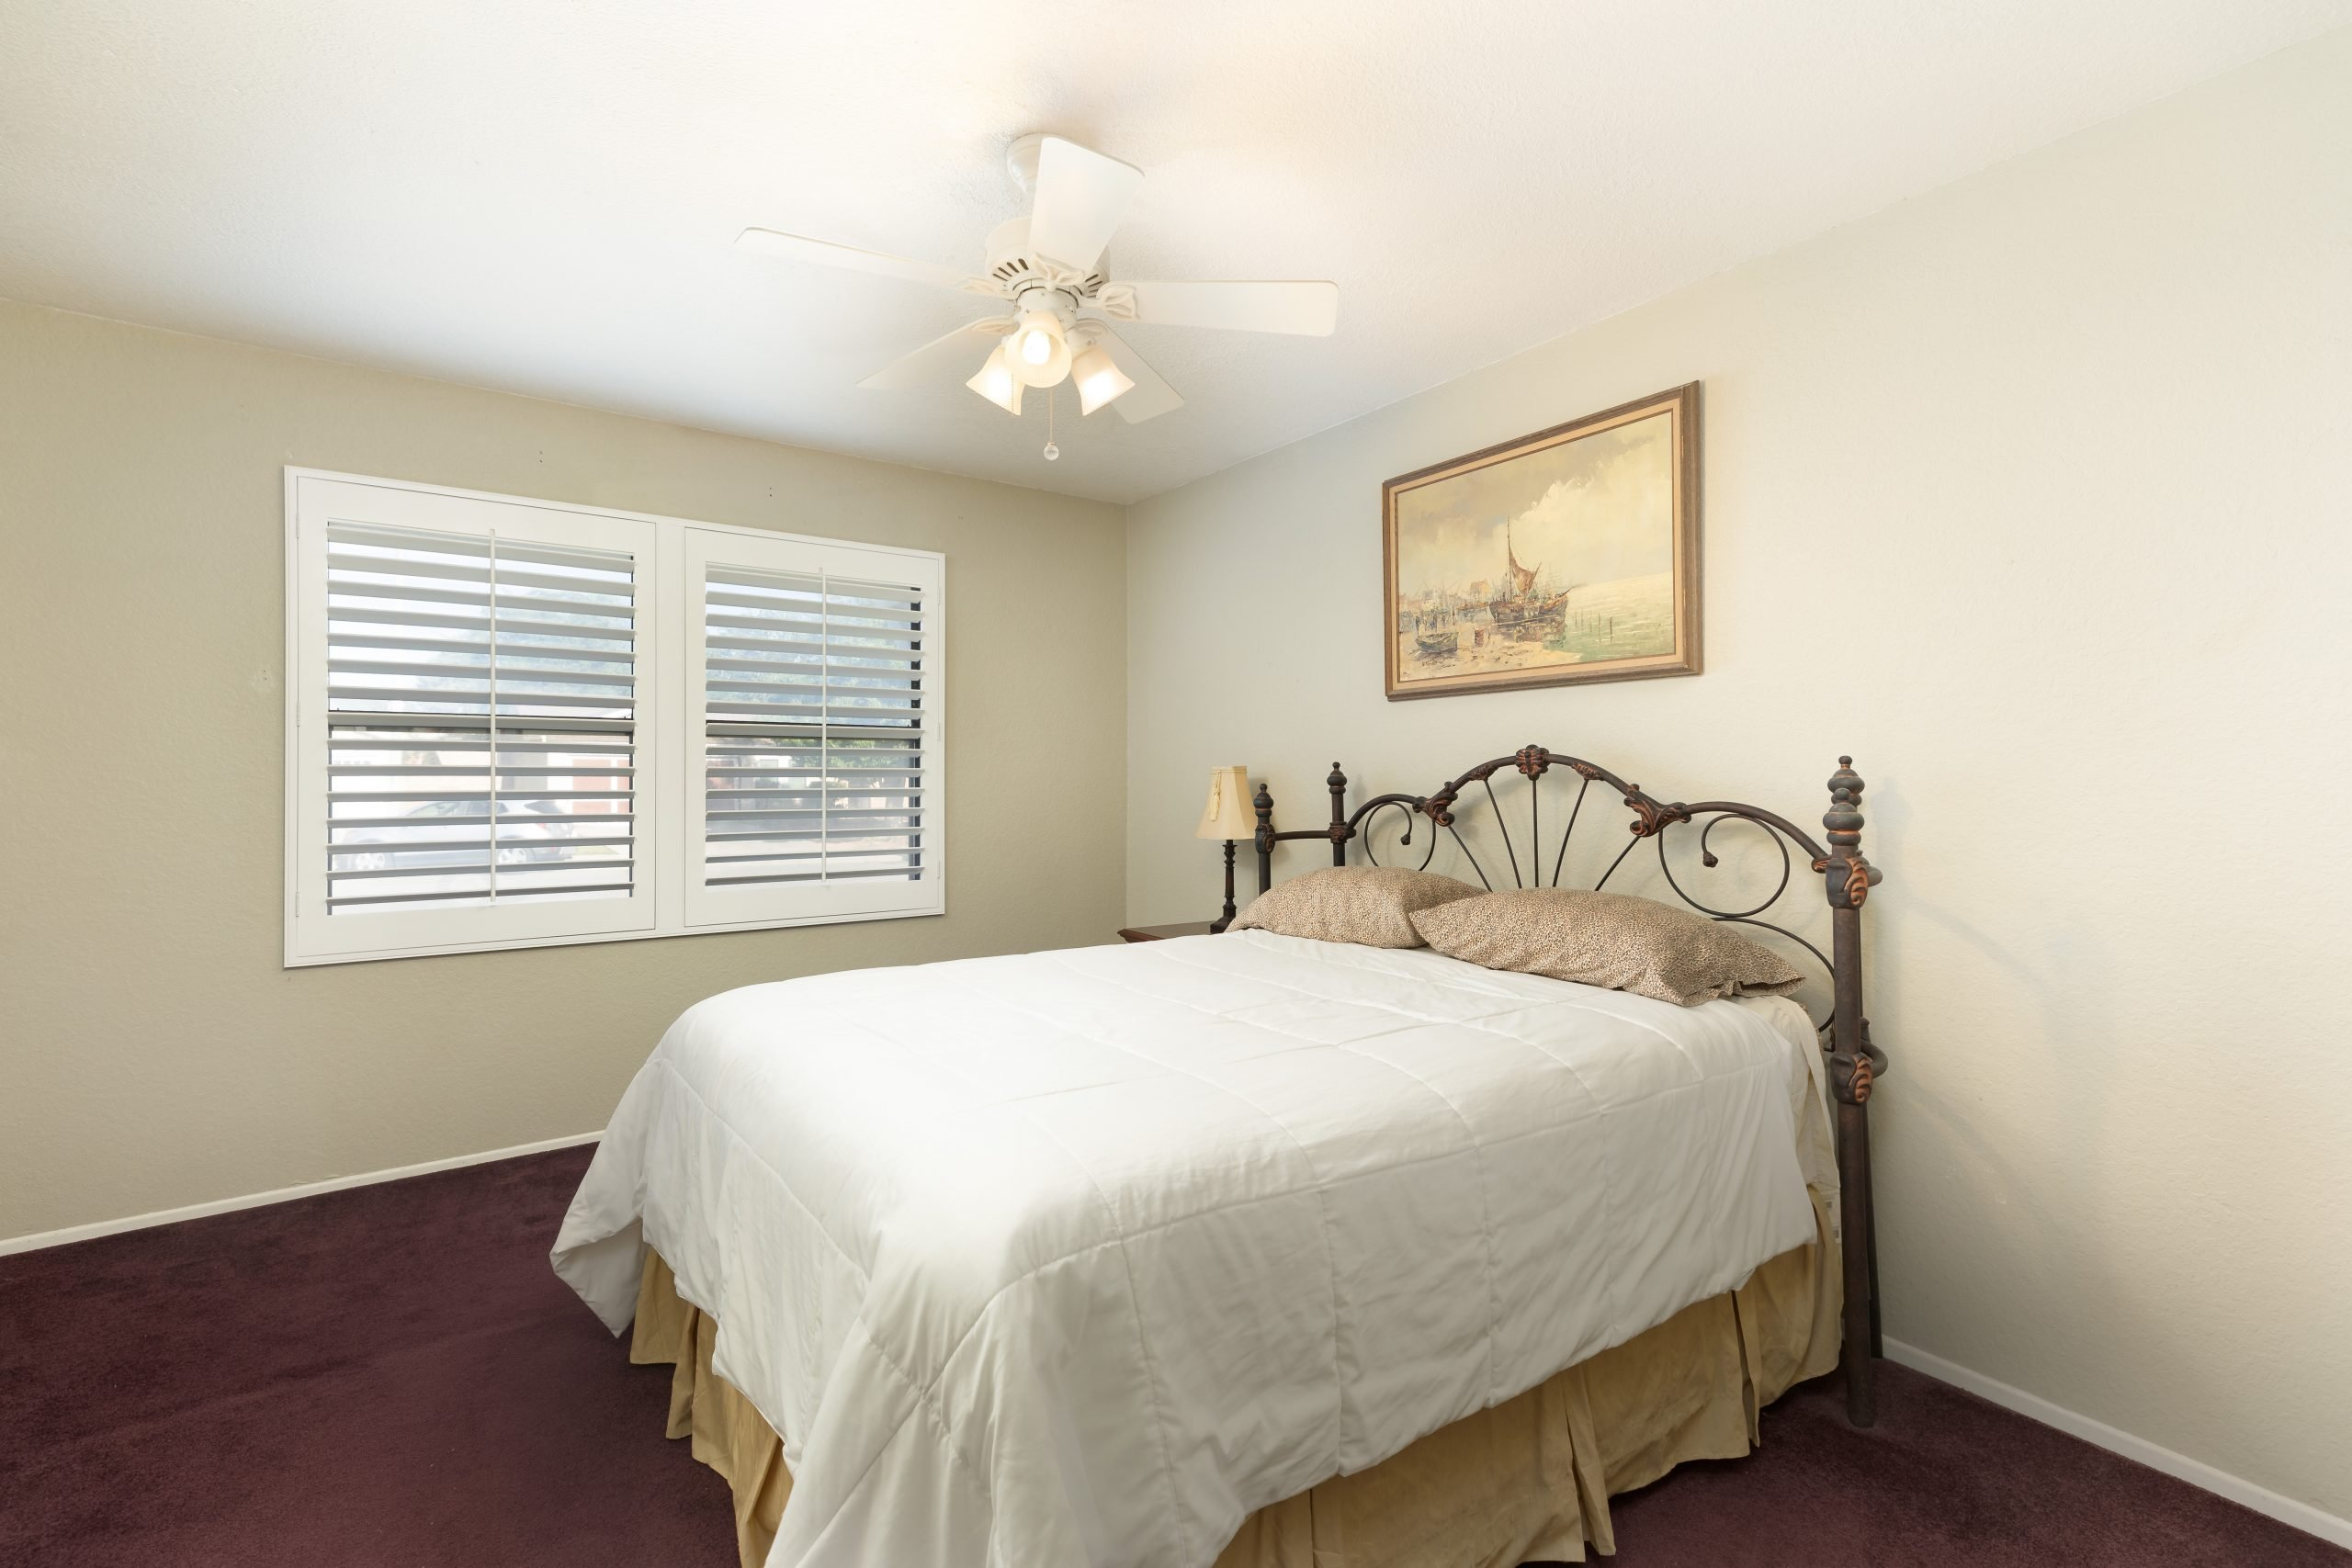 Palmdale CA Real Estate 37128 Marye Margo Circle Palmdale Bedroom One